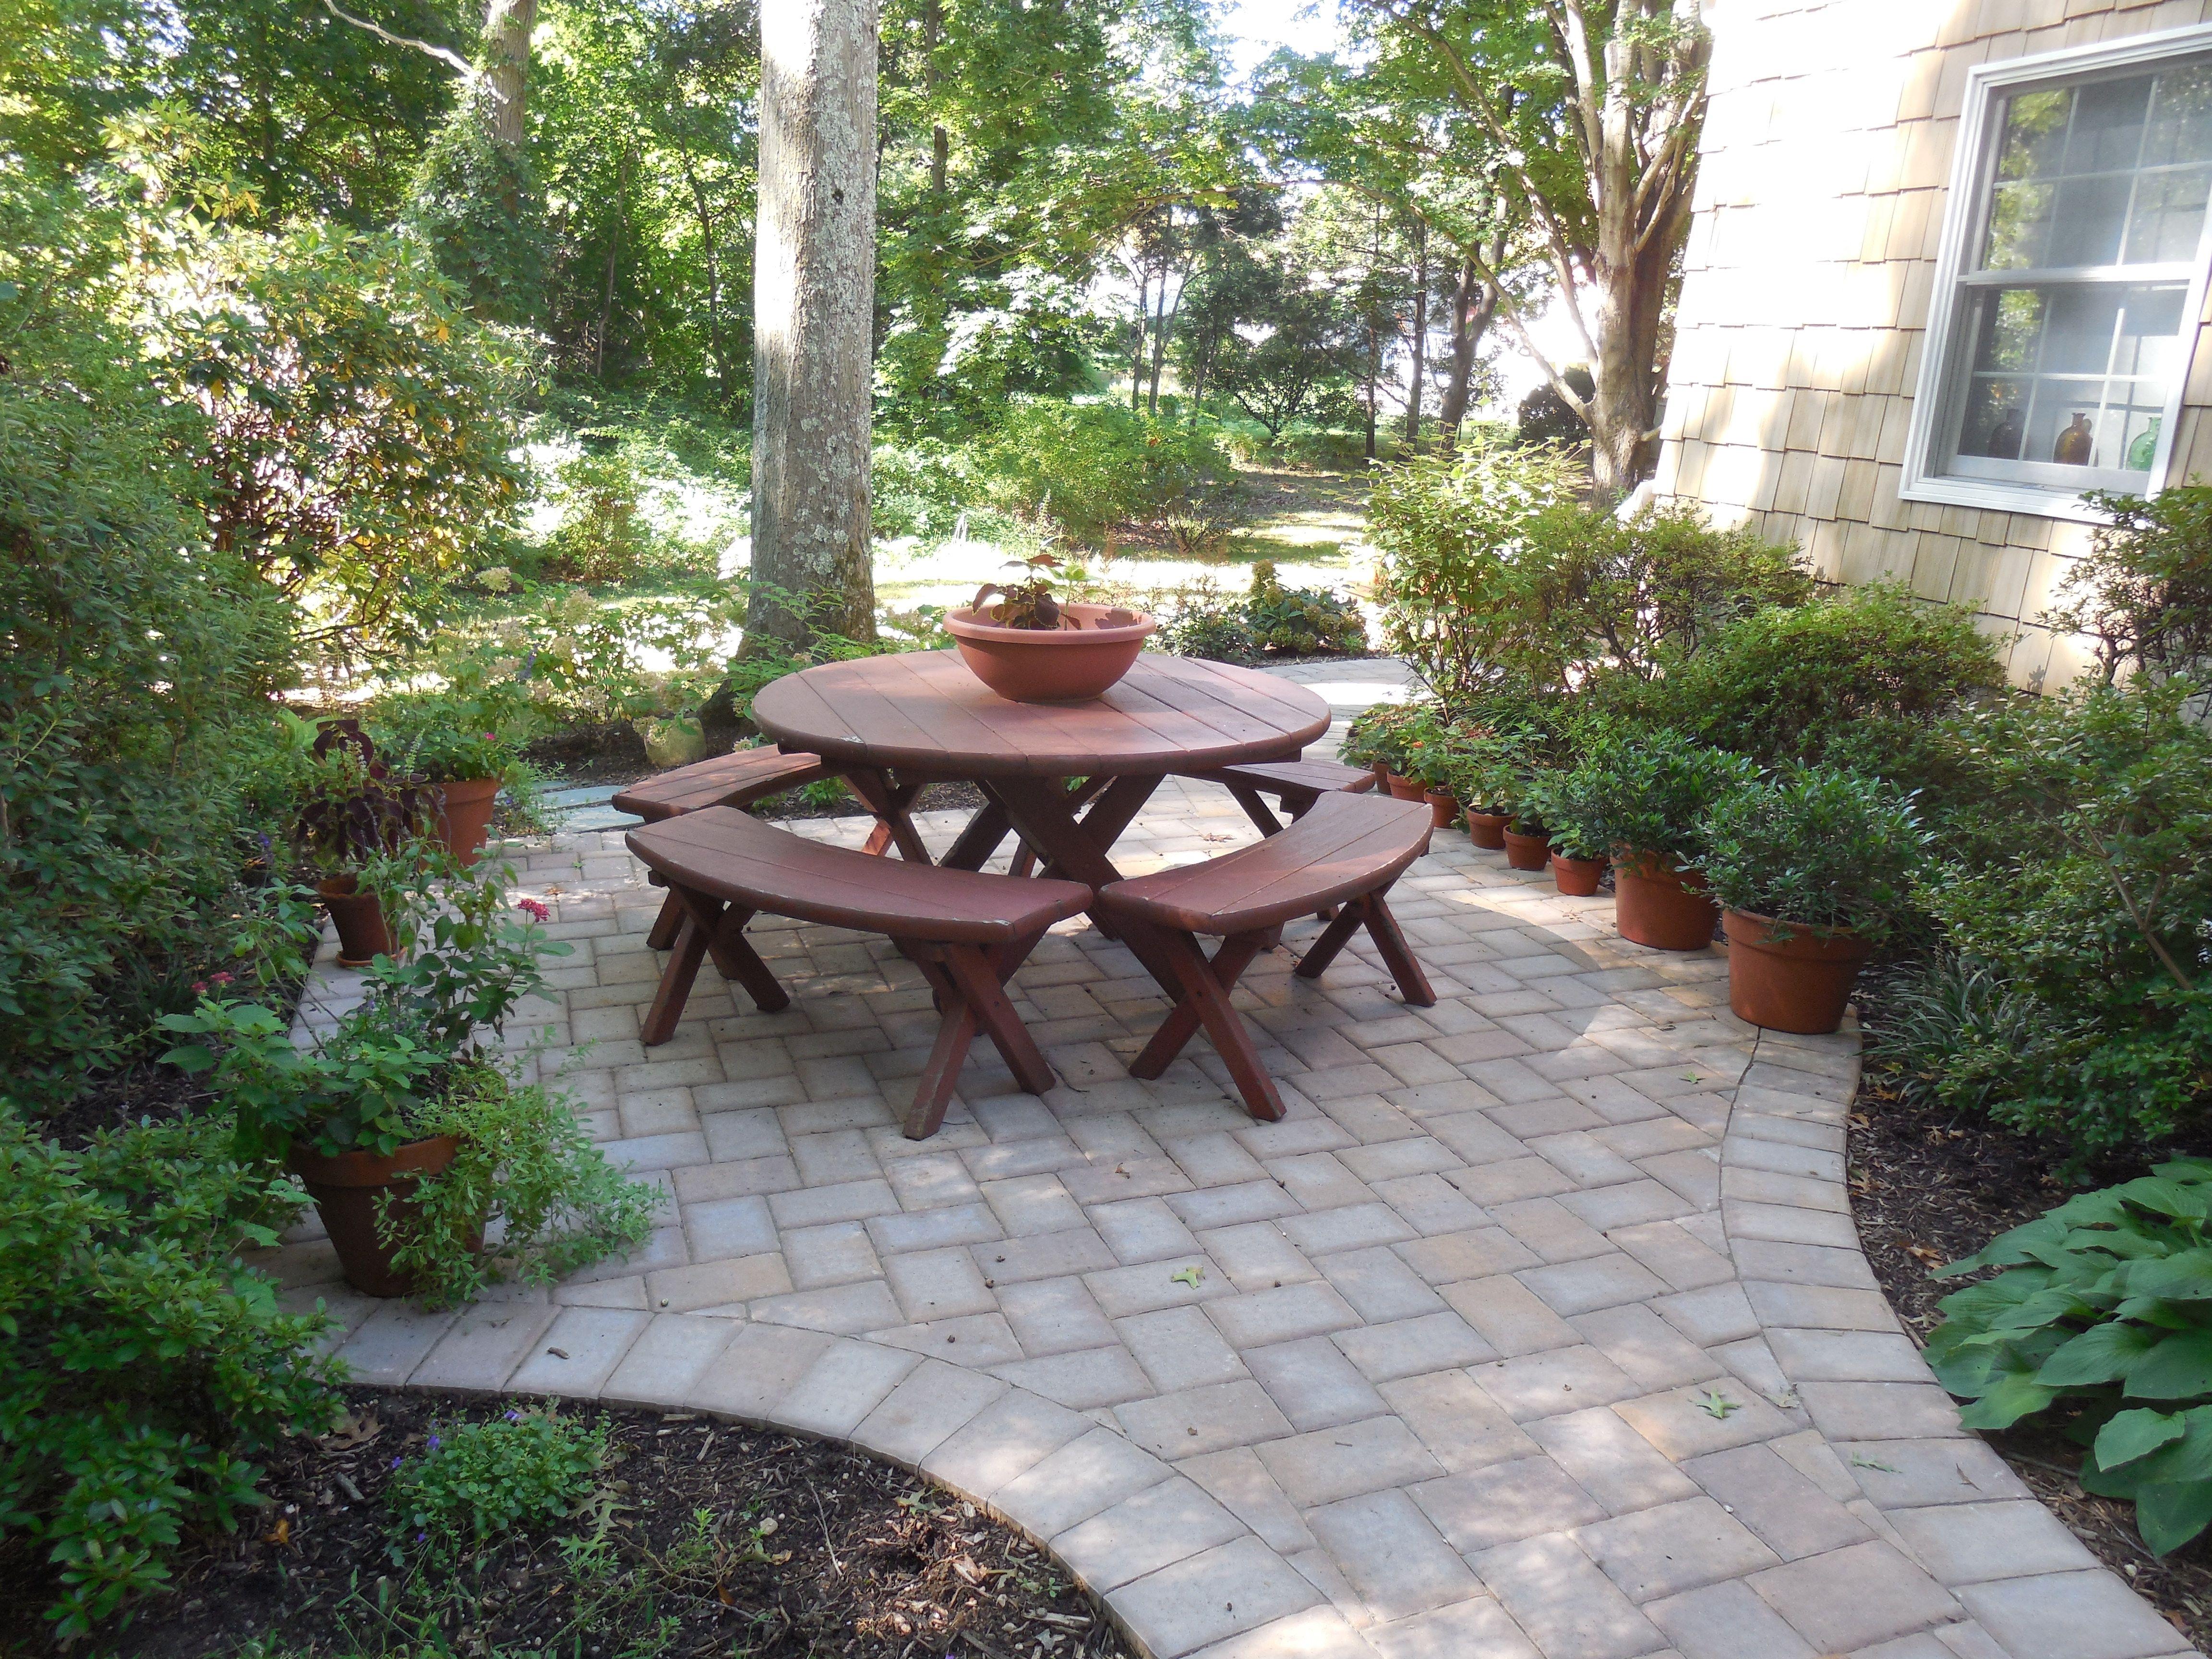 Pin By Nova Williams On Hardscapes Hardscape Patio Concrete Pavers Backyard garden arcadia wi